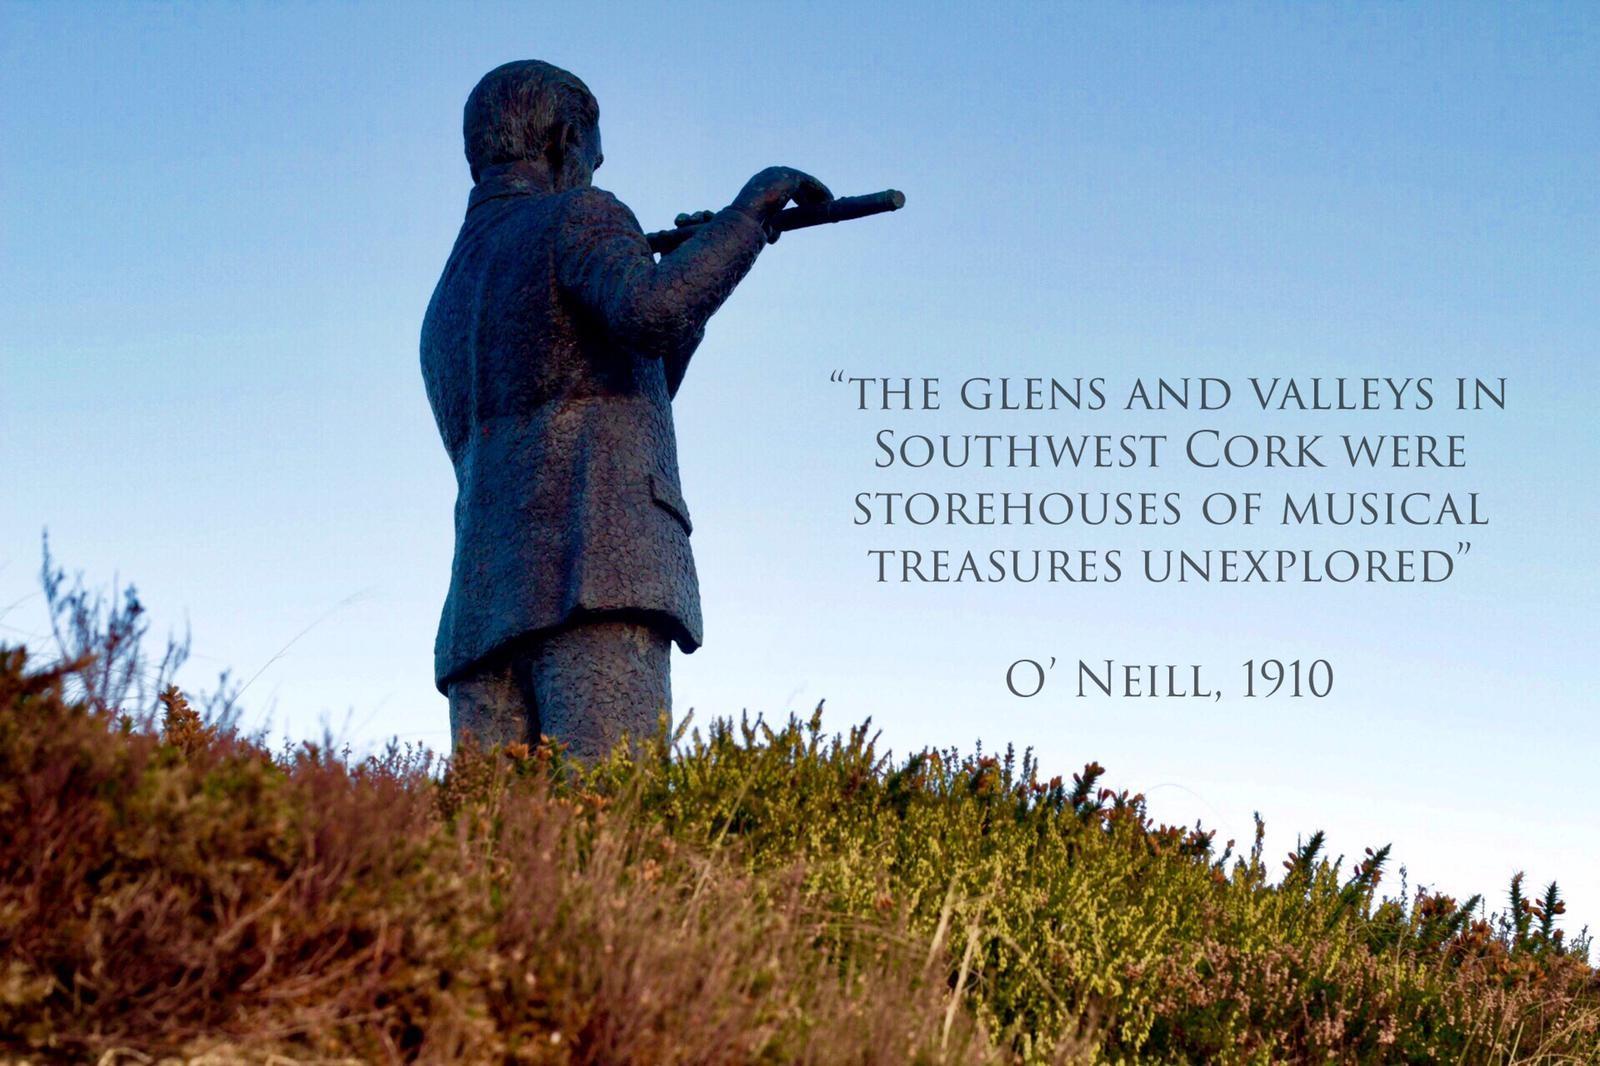 O Neill monument, Tralibane